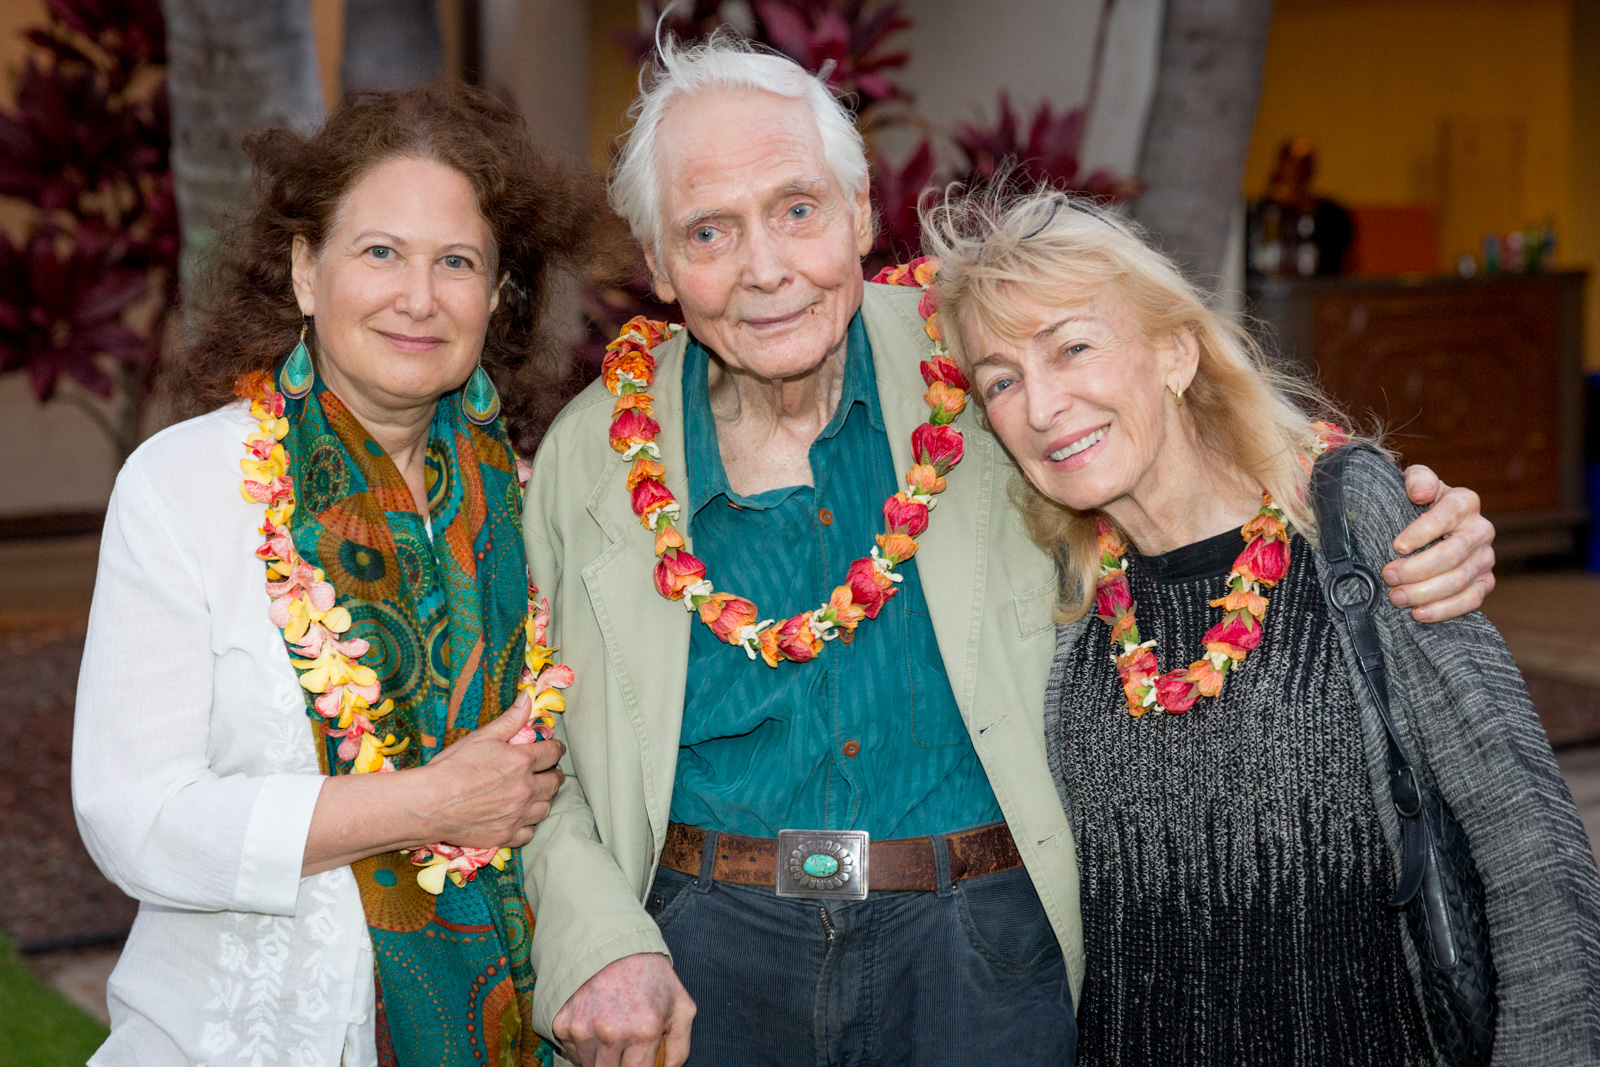 Jane Hirshfield, W.S. Merwin, and Paula Merwin